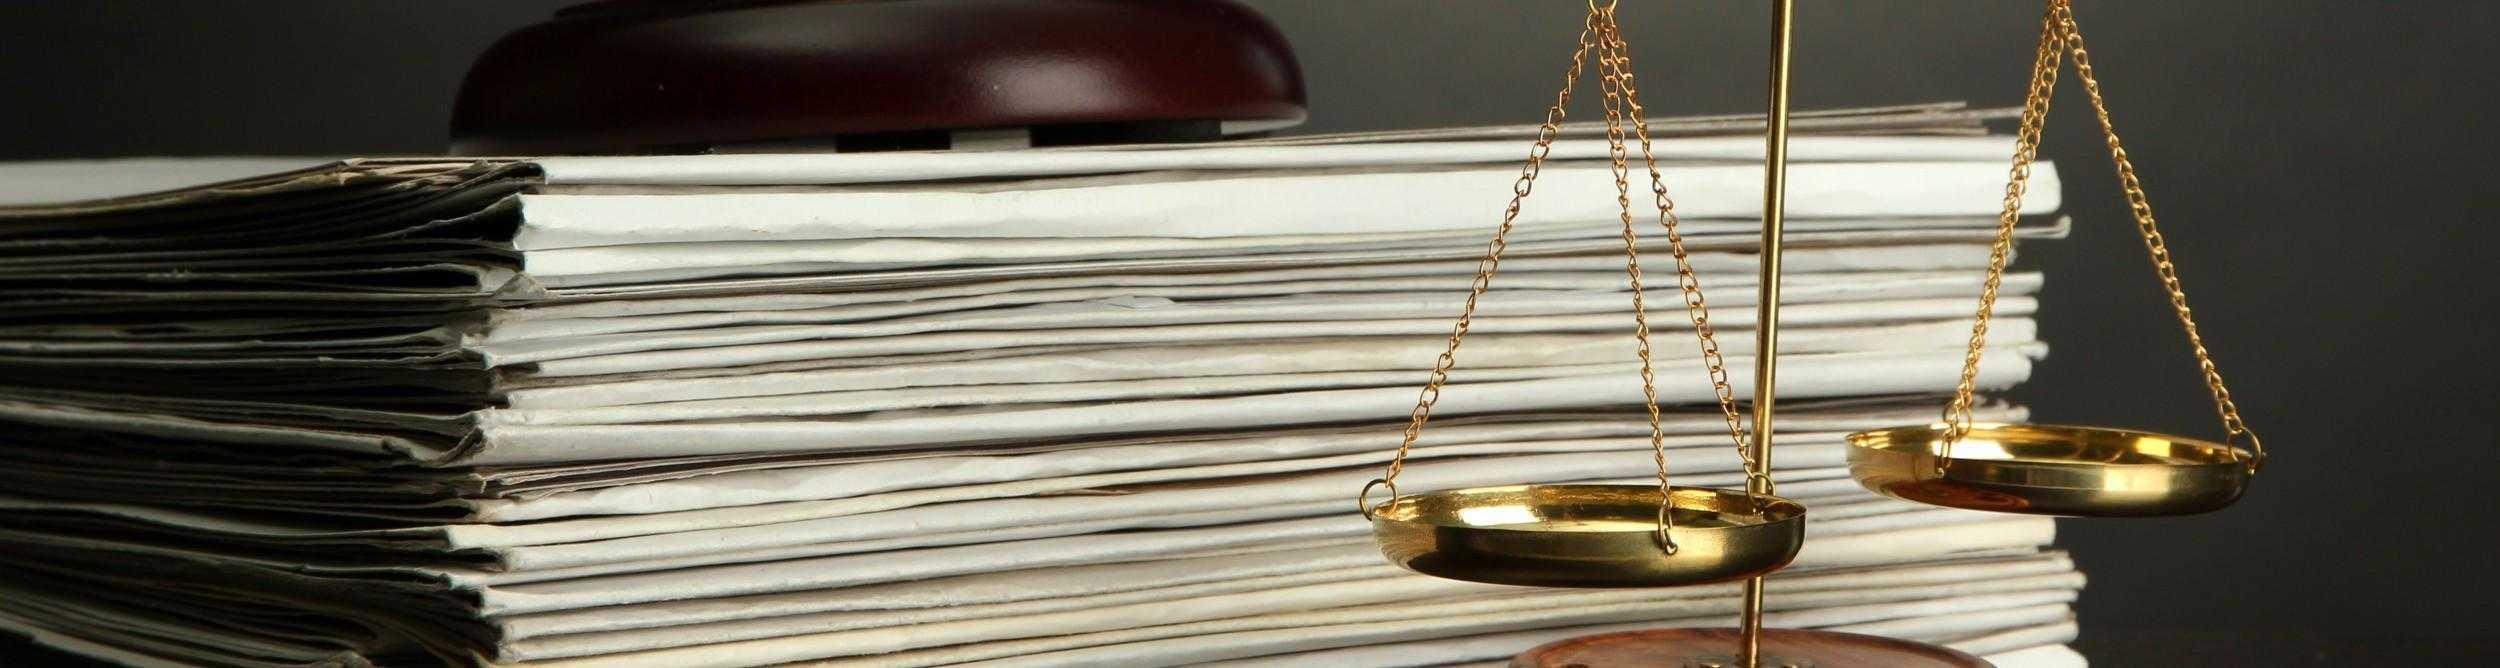 ФНС подготовила план администрирования страховых взносов в ПФР и ФСС